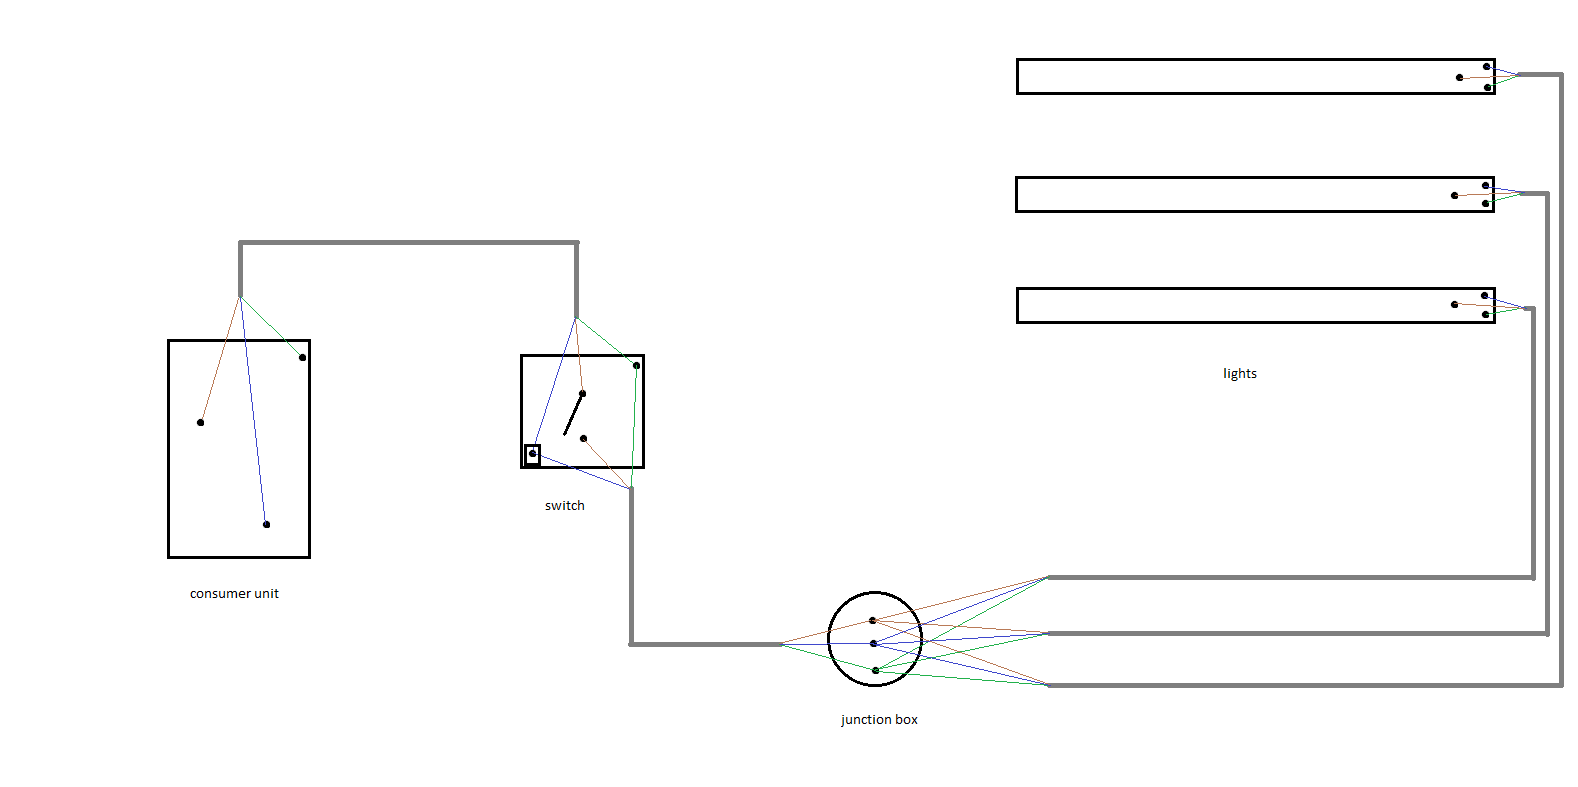 batten holder wiring diagram 12 volt flasher ultimatehandyman co uk  view topic 3 lights